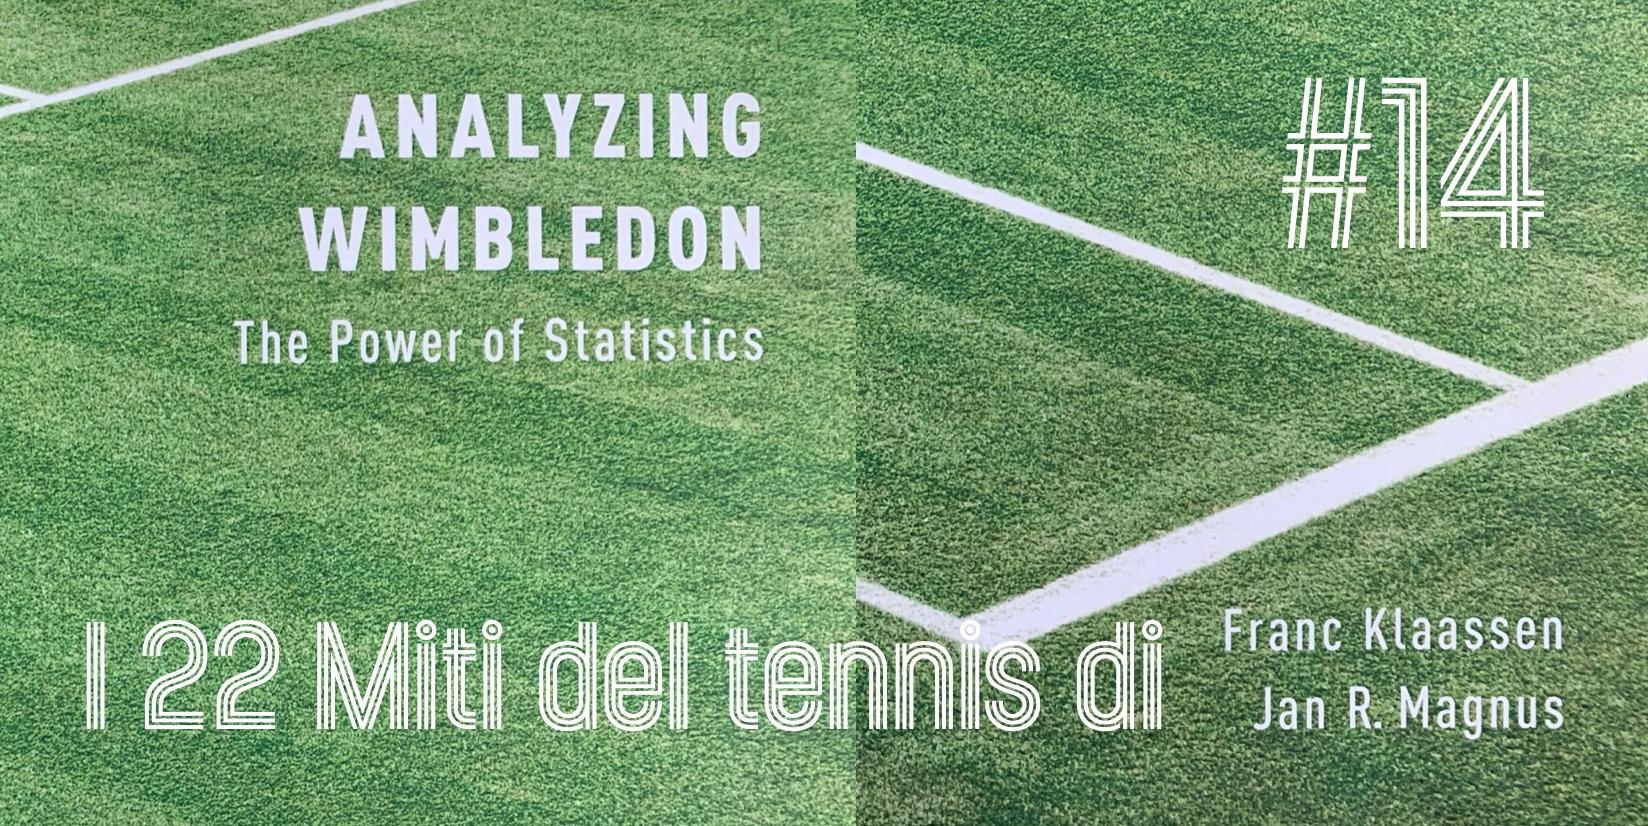 I 22 miti del tennis di Klaassen & Magnus – Mito 14 - settesei.it